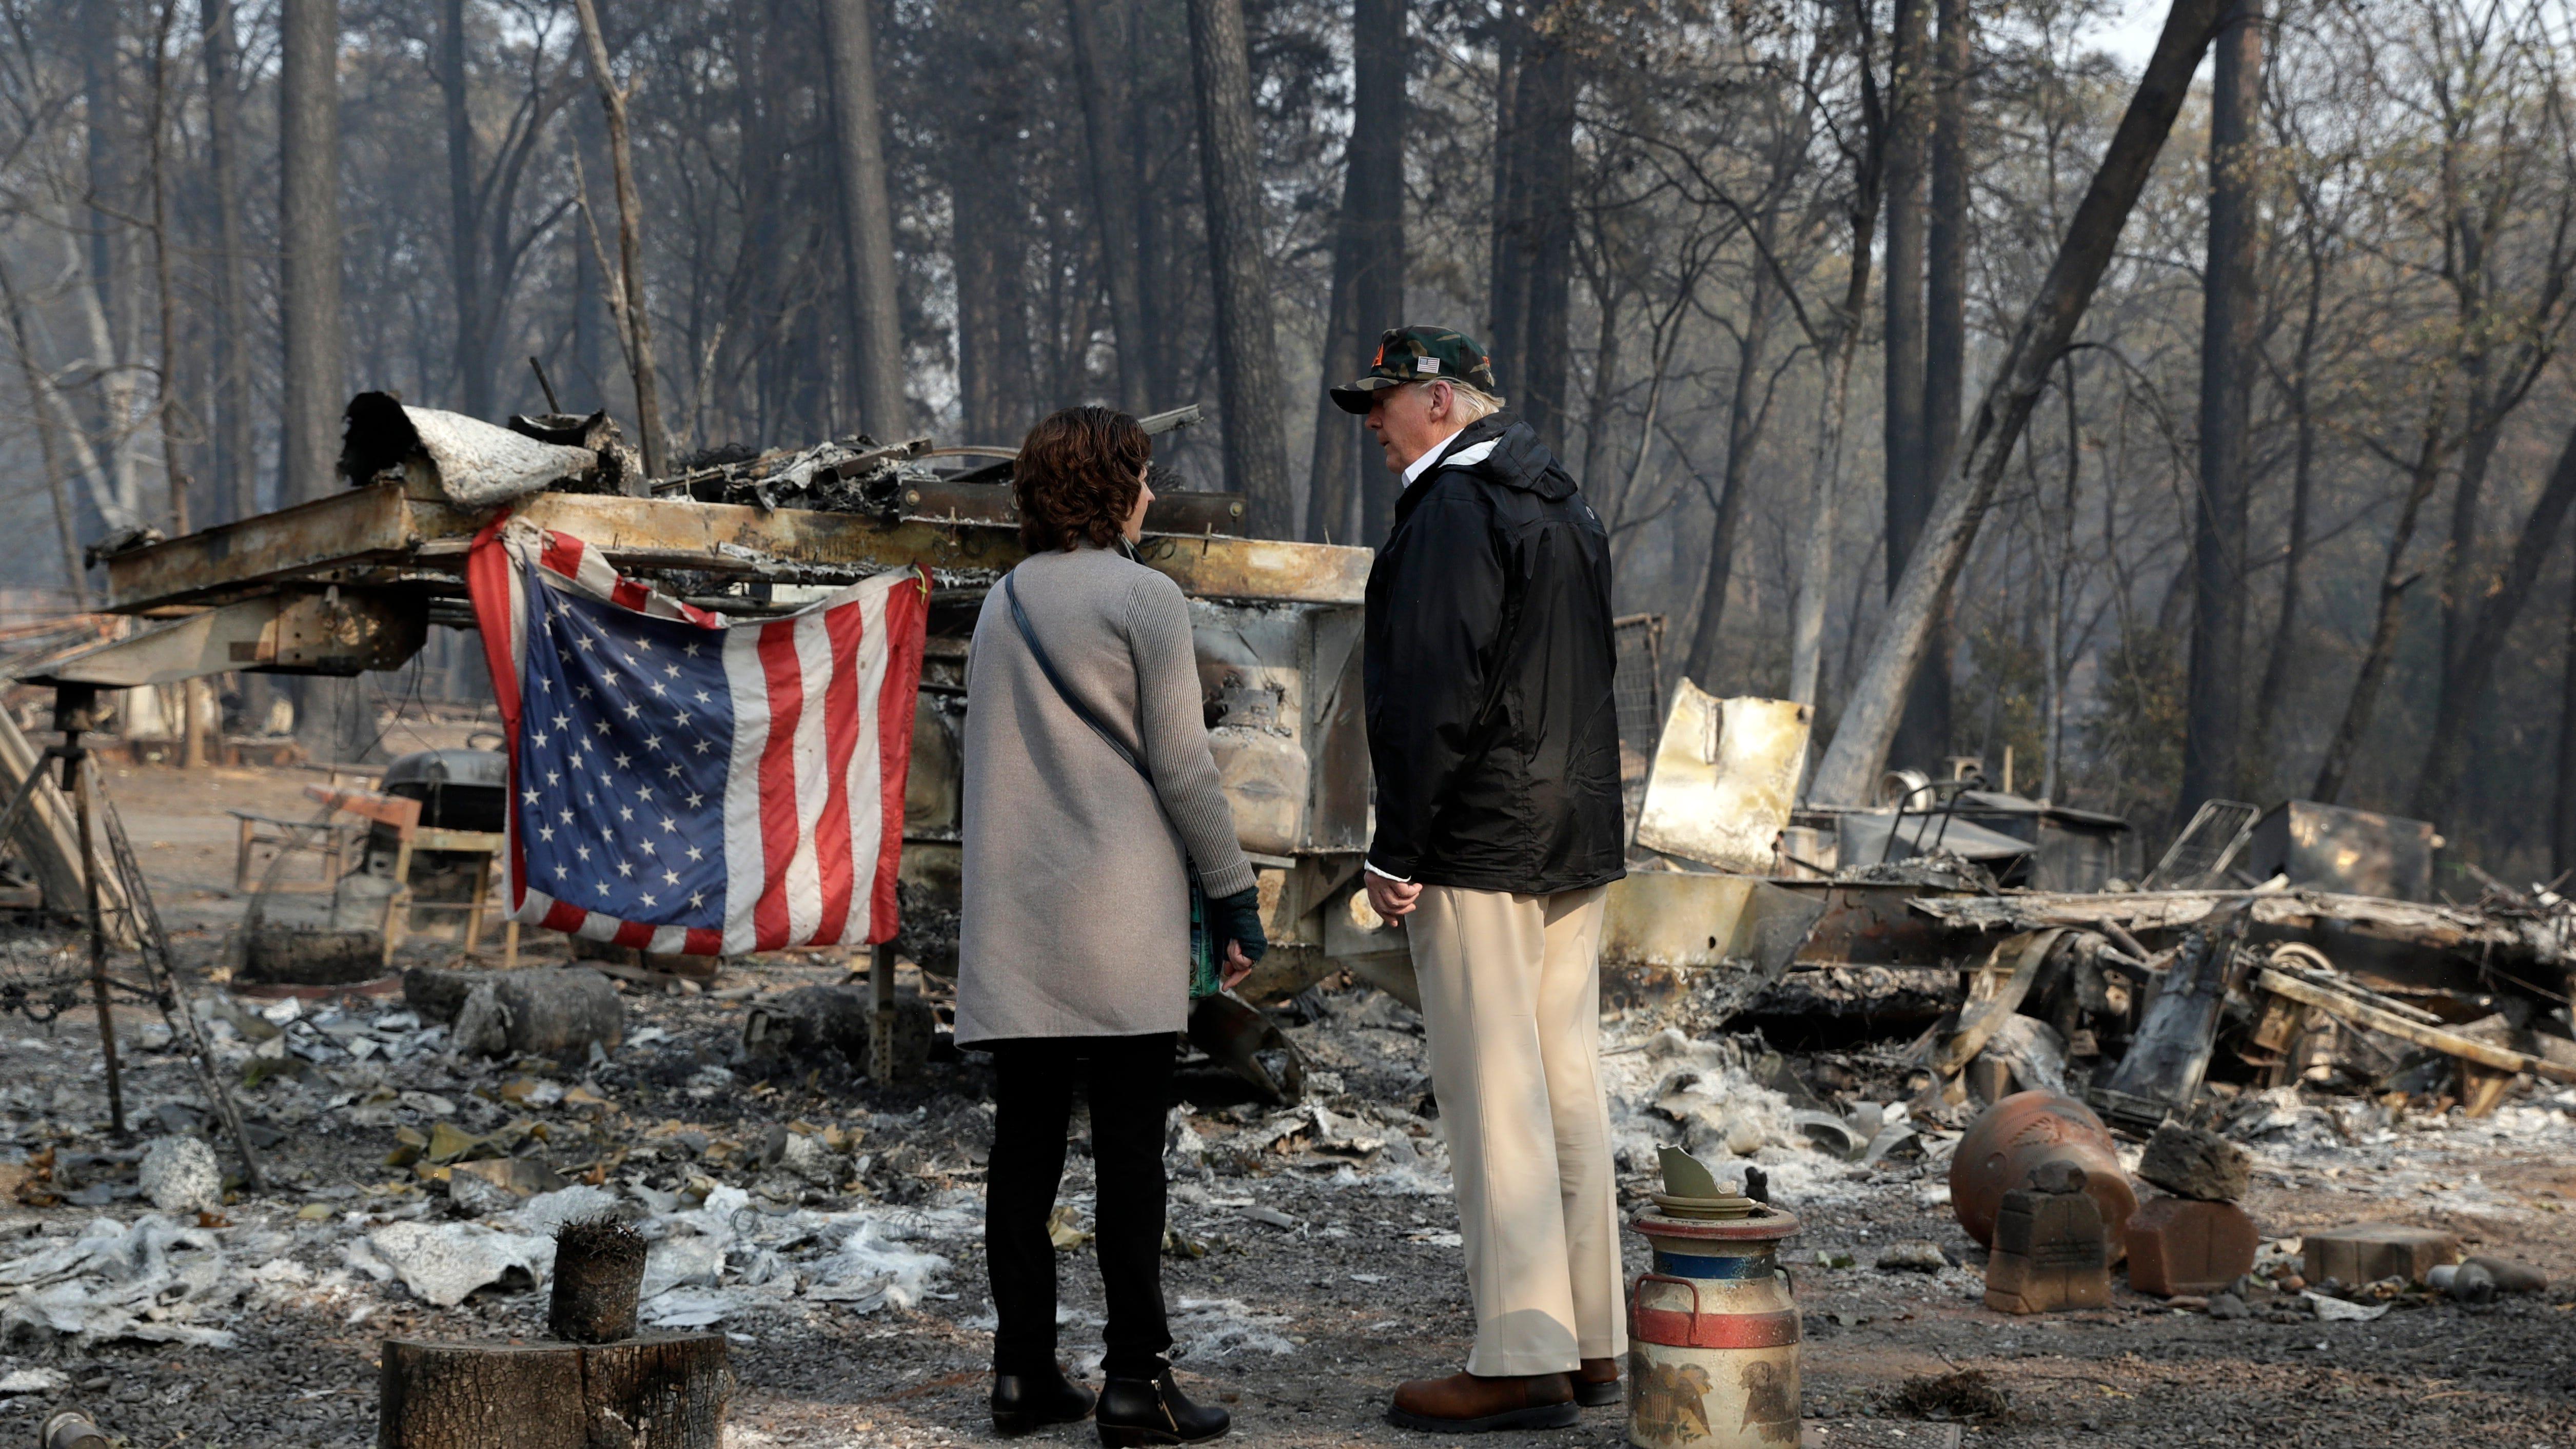 President Donald Trump talks to Mayor Jody Jones as he visits a neighborhood impacted by the wildfires, Saturday, Nov. 17, 2018, in Paradise, Calif. (AP Photo/Evan Vucci)